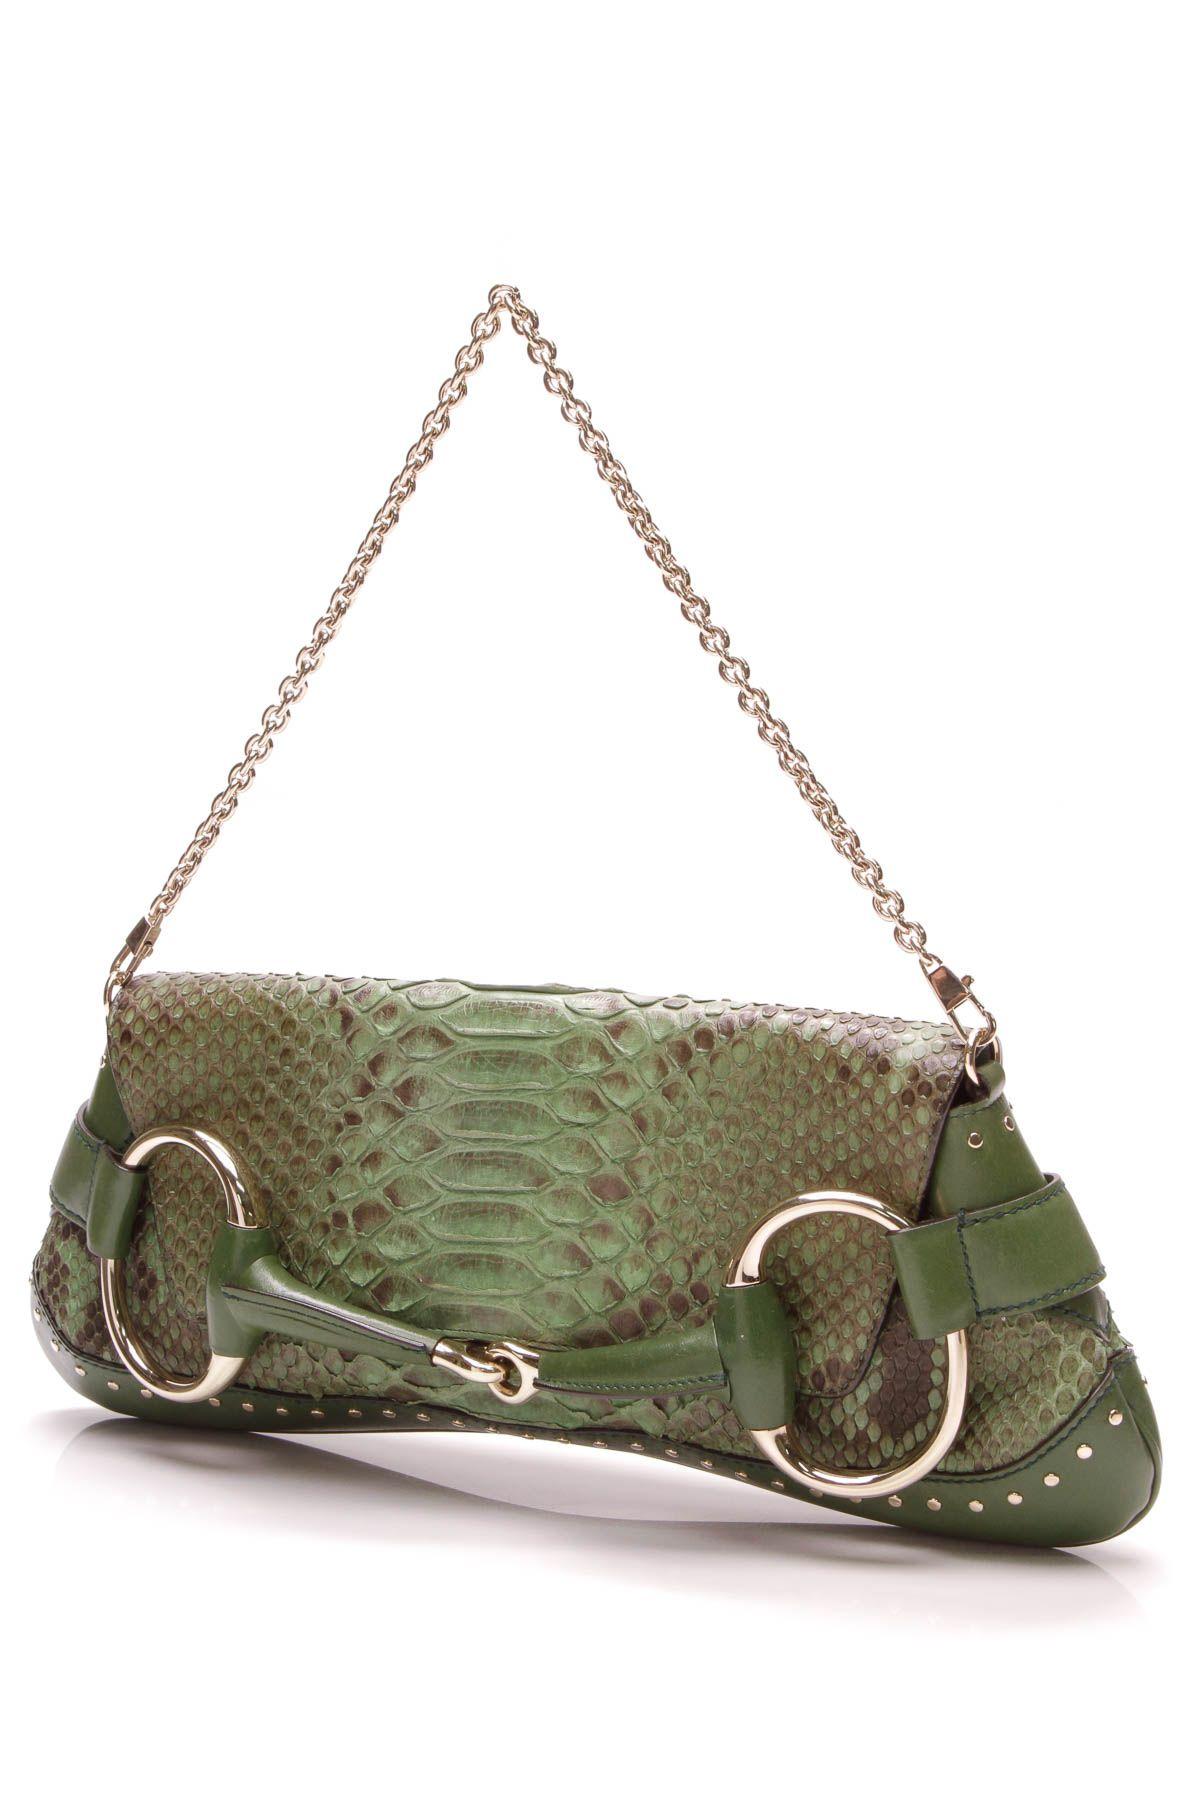 66e40d6ac32484 Large Horsebit Chain Clutch Bag - Green Python in 2019 | Gucci Glam ...